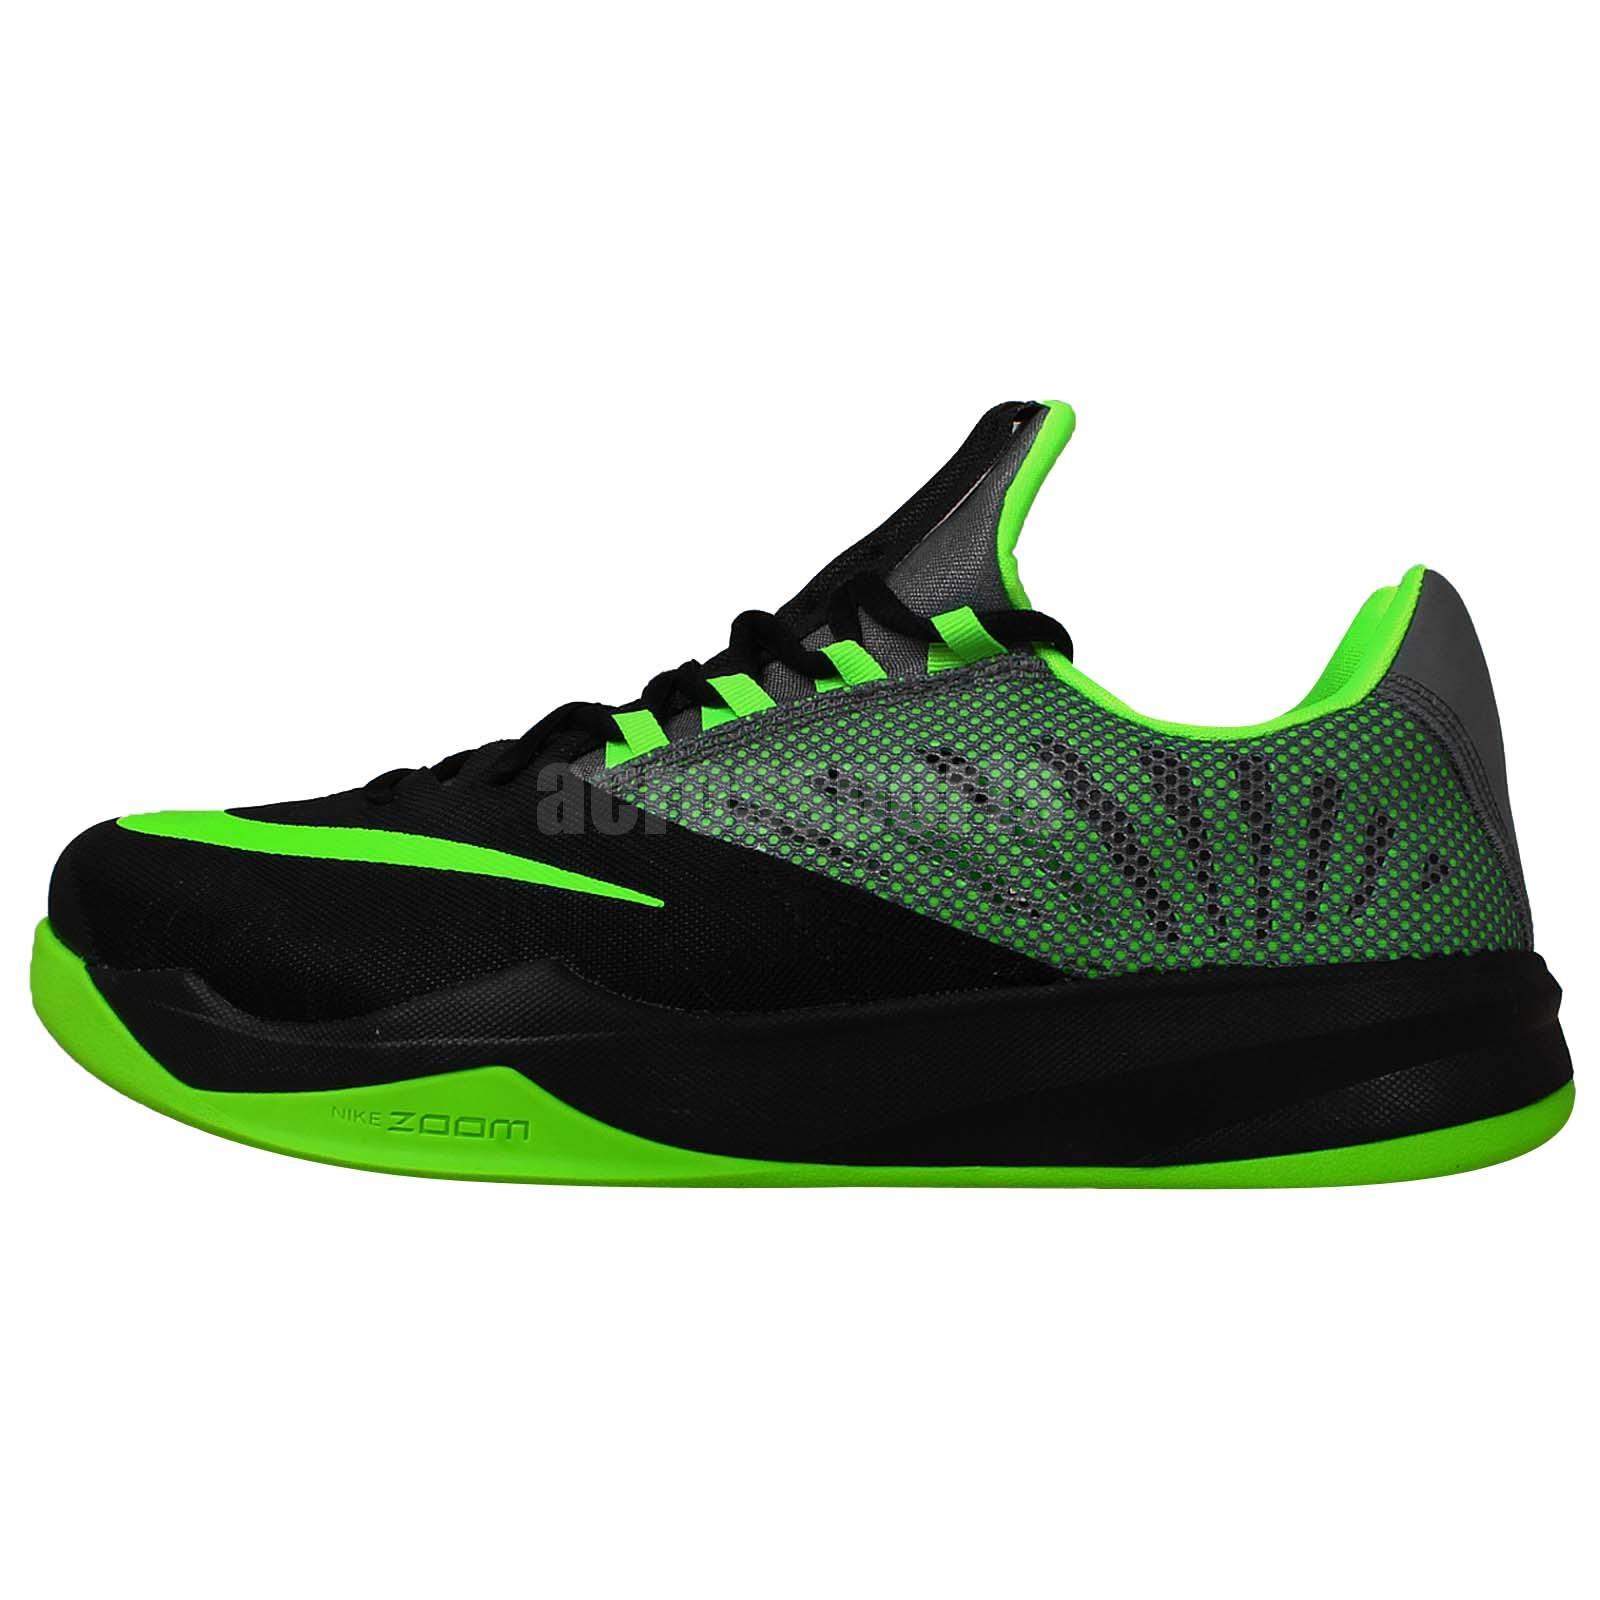 Nike Zoom Run The One Basketball Shoes